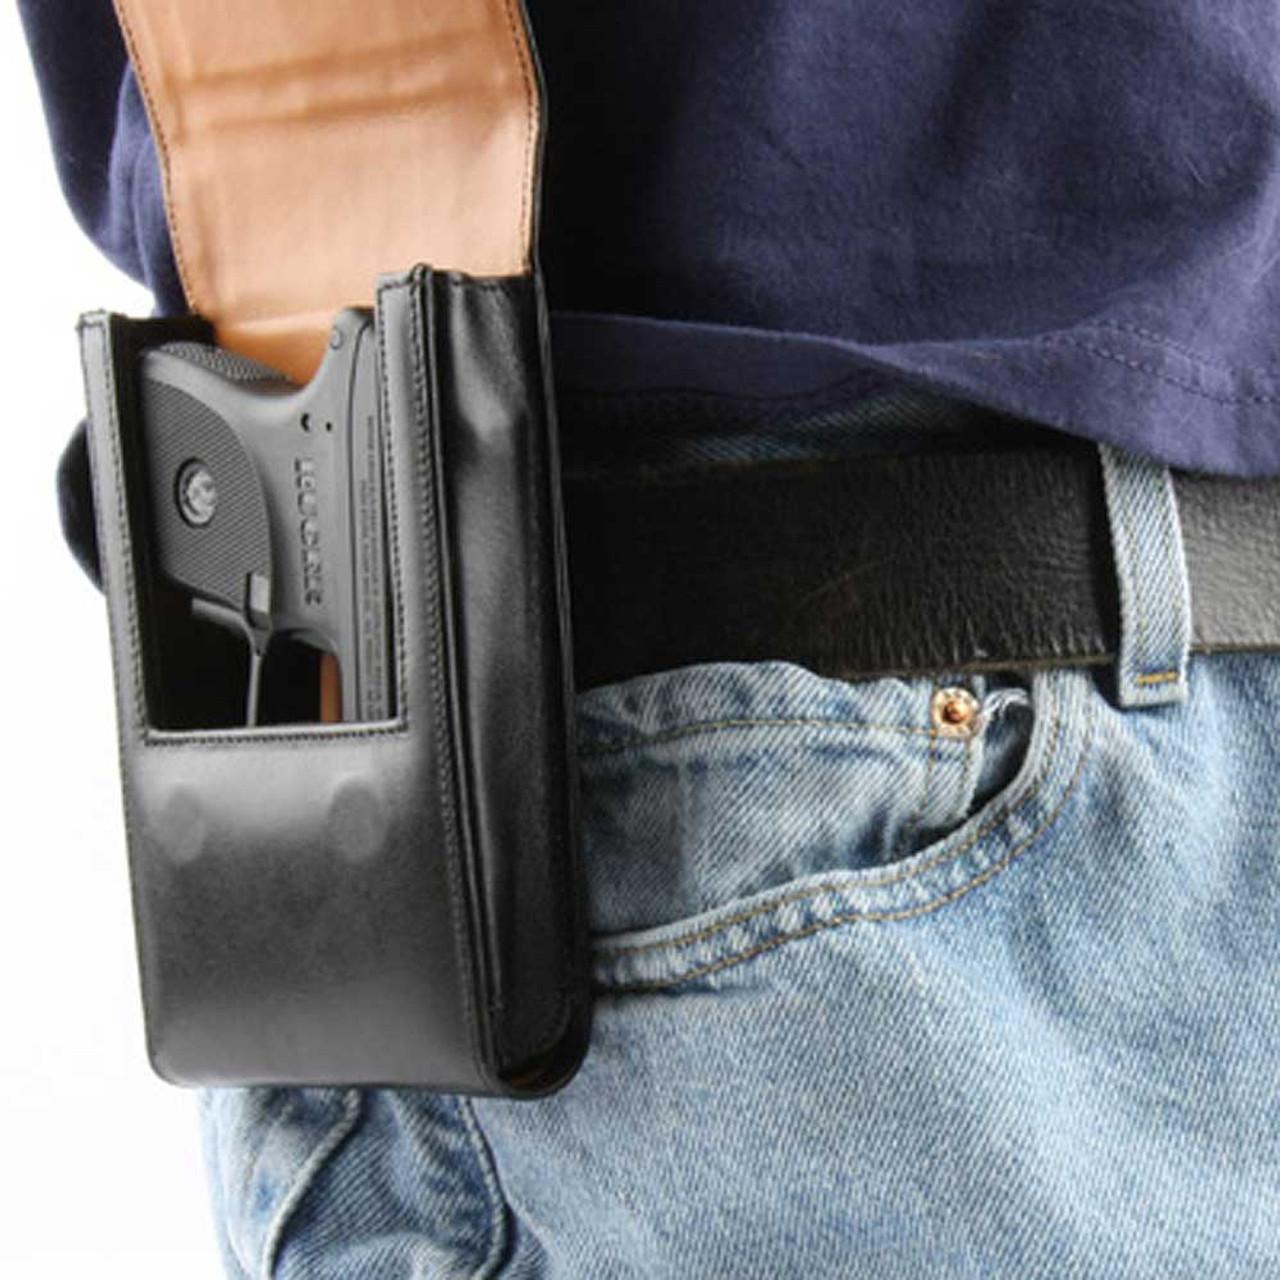 Keltec P32 Concealed Carry Holster (Belt Loop)